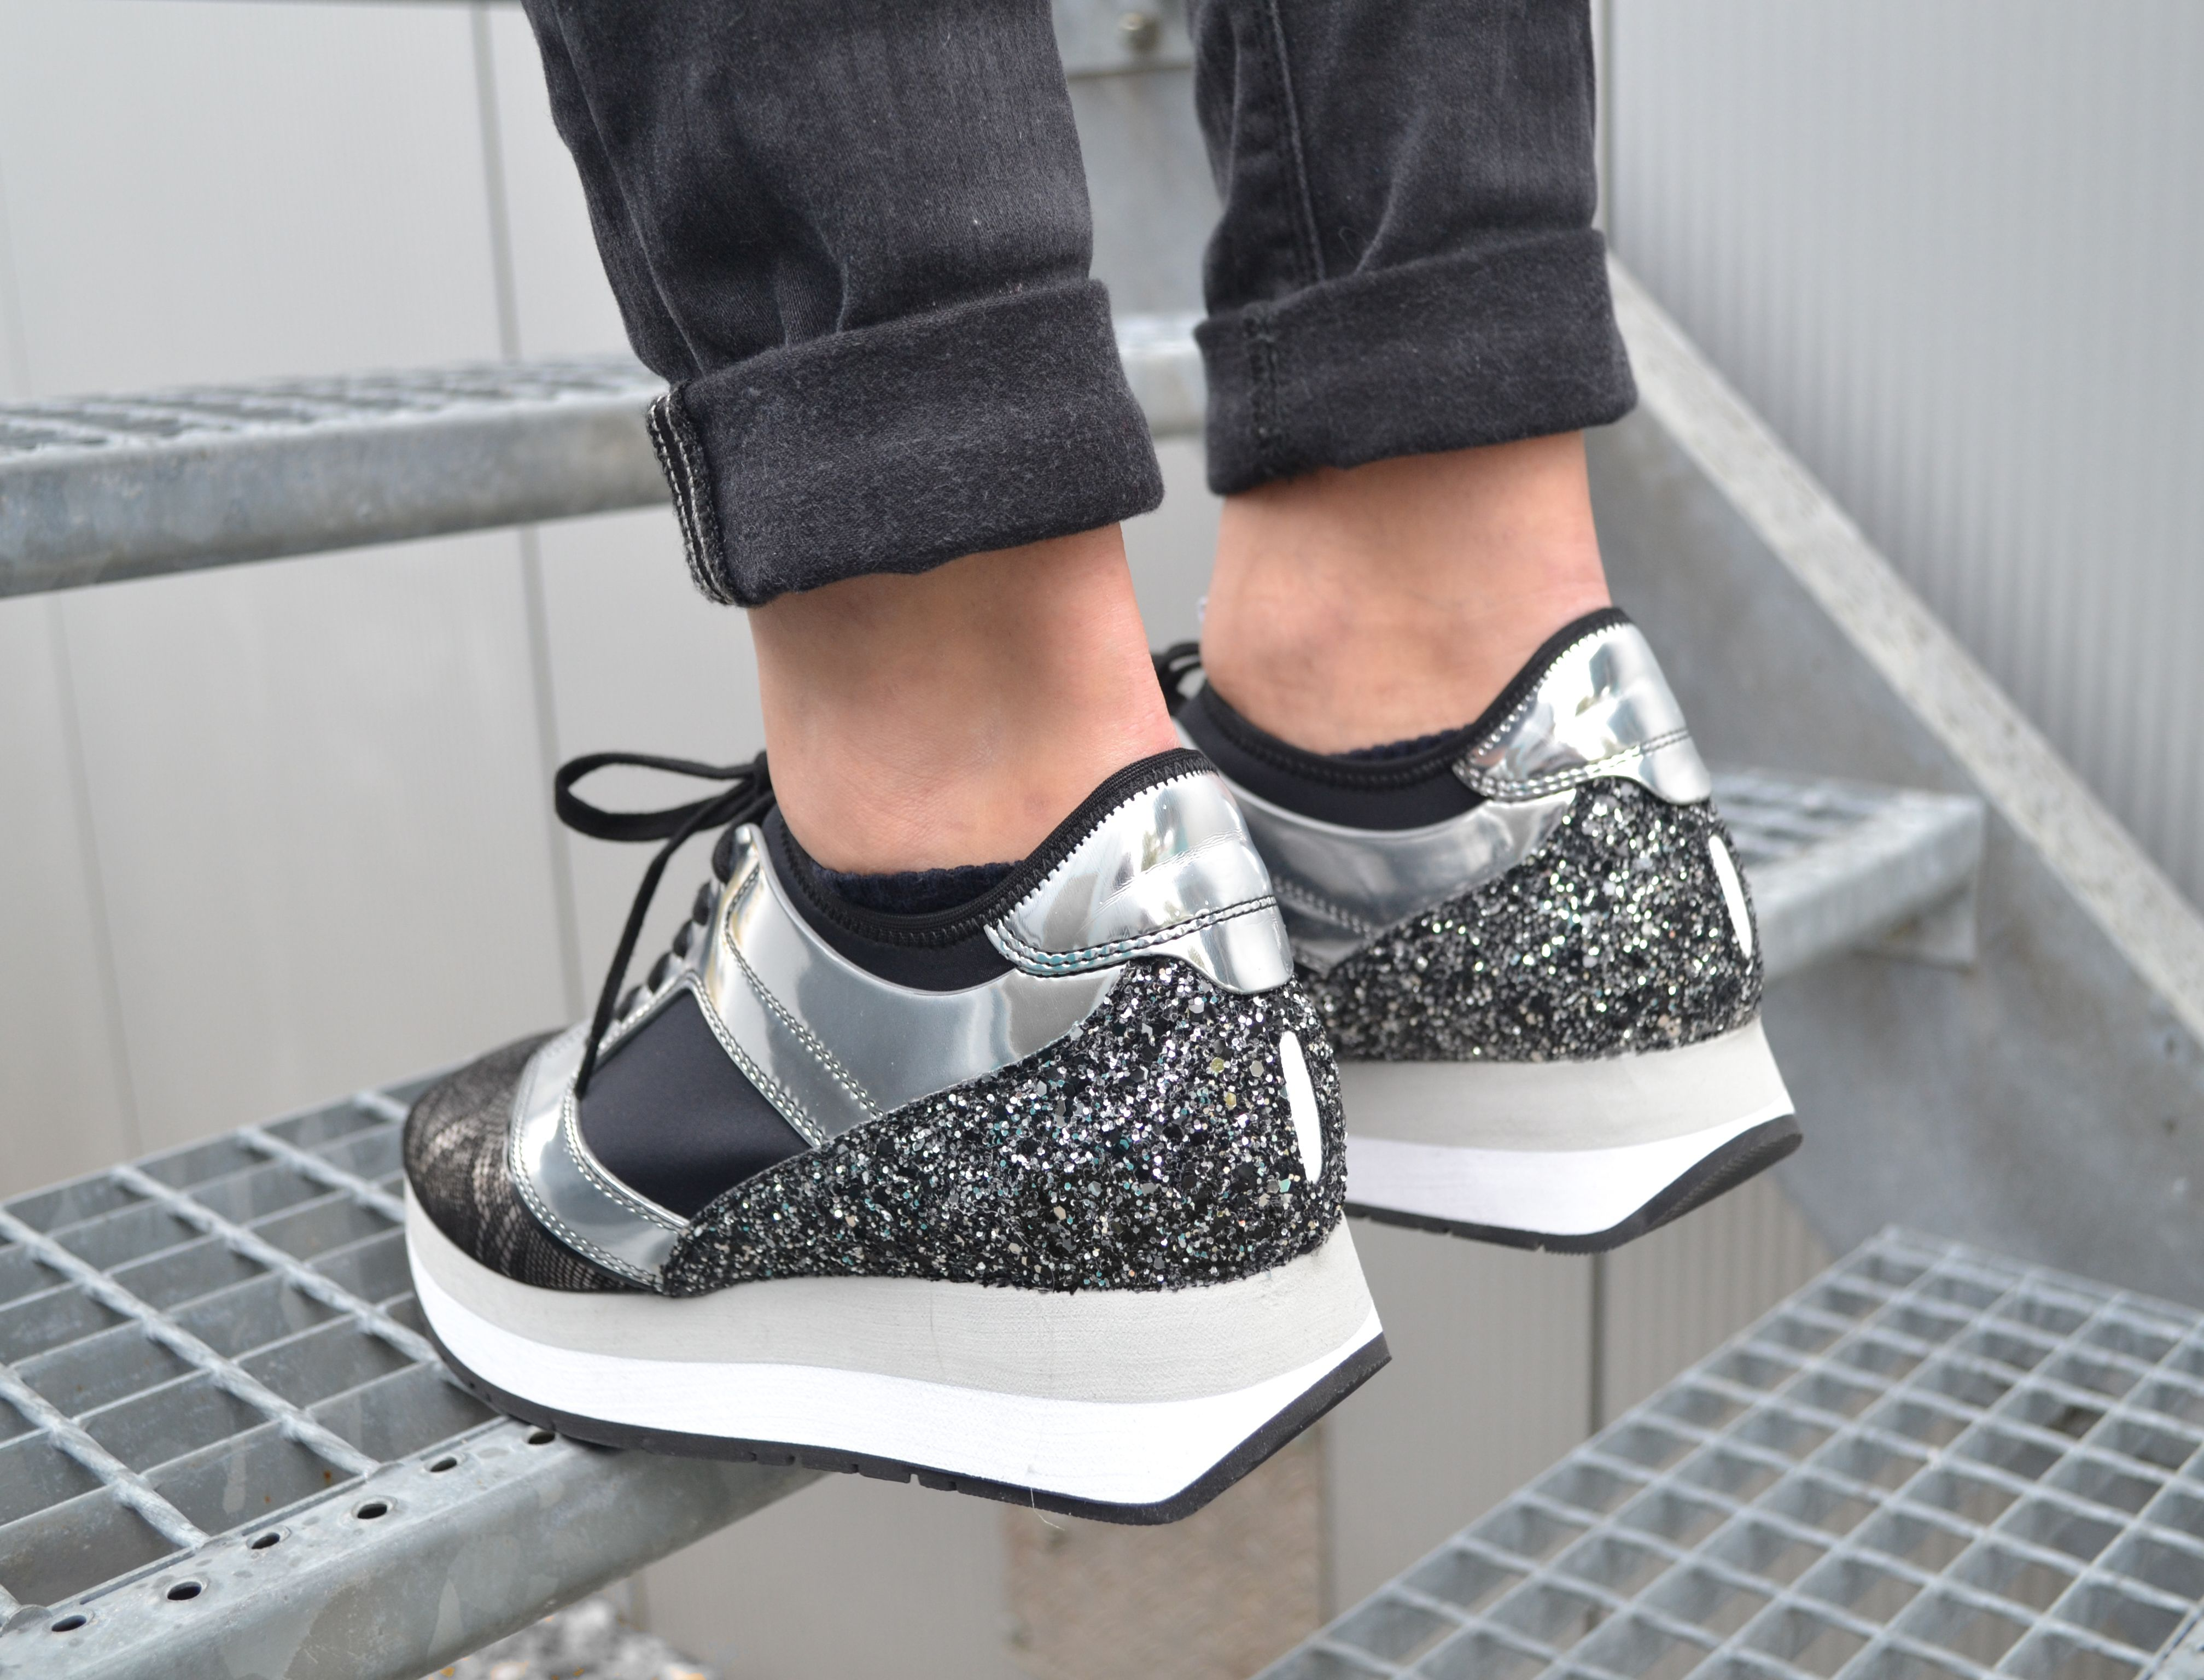 bikkembergs sneaker mit plateau schwarz silber sneaker sneakerlove we sneaker pinterest. Black Bedroom Furniture Sets. Home Design Ideas